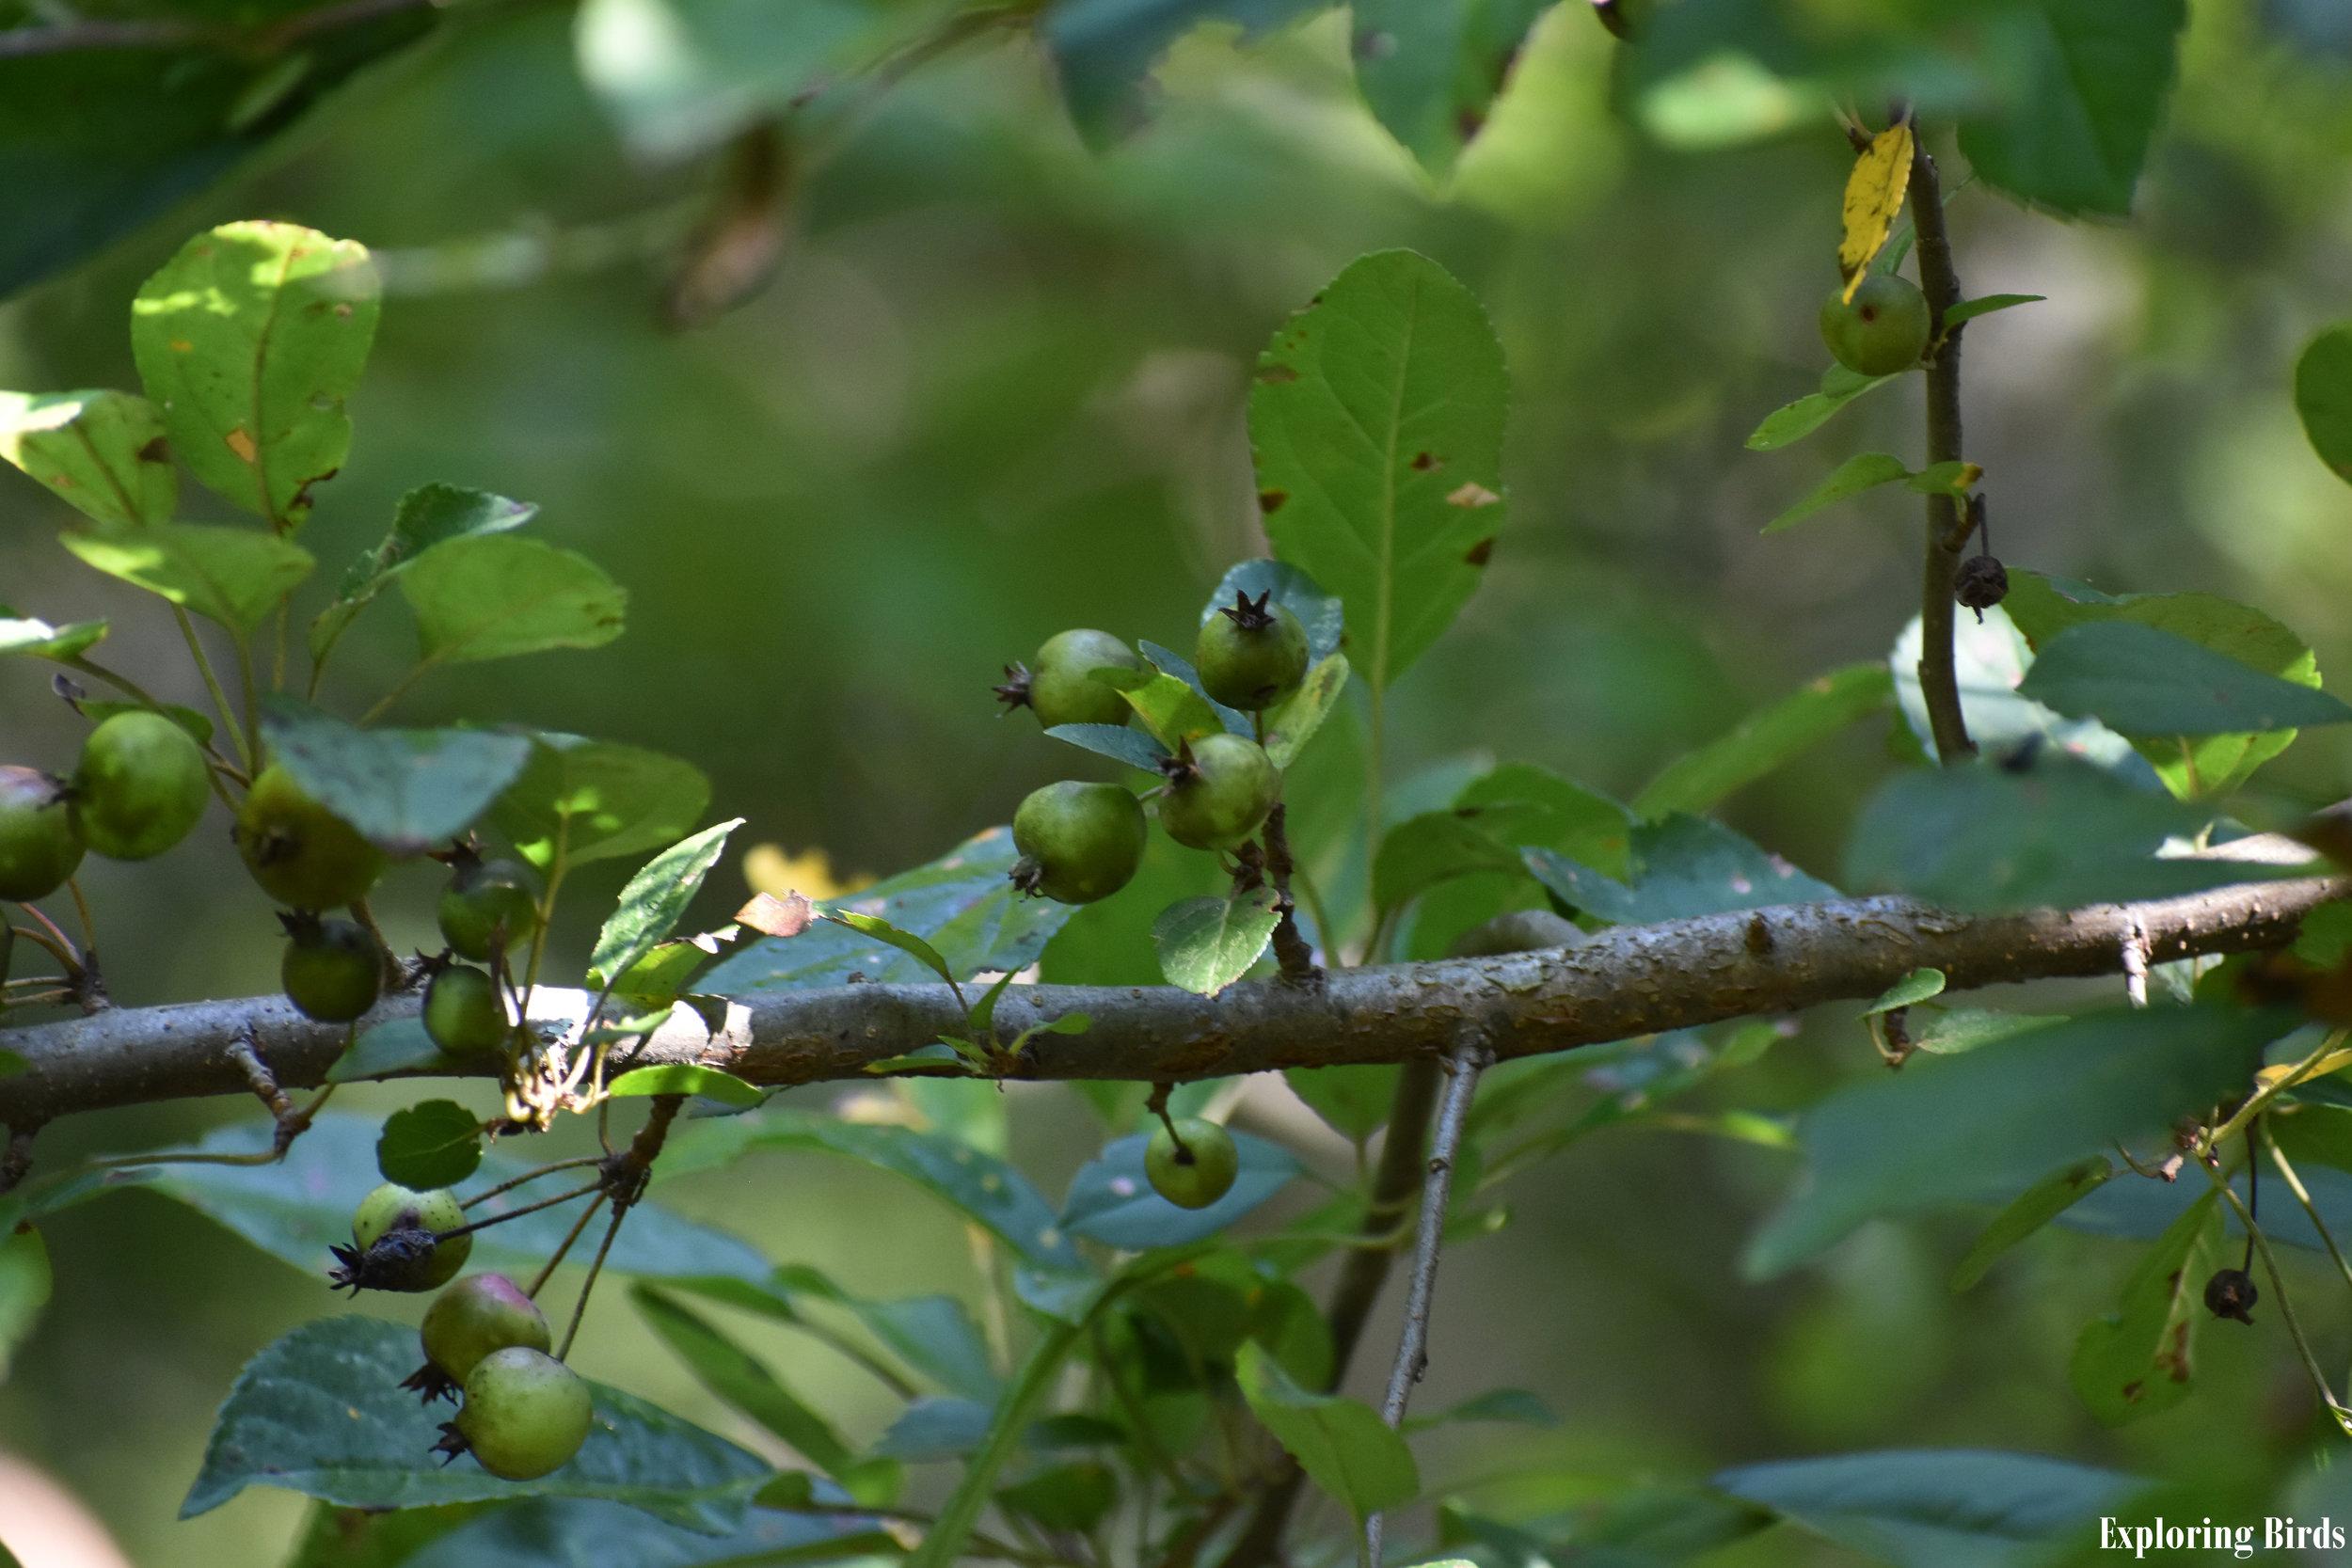 American Crabapple attracts Northern Mockingbird